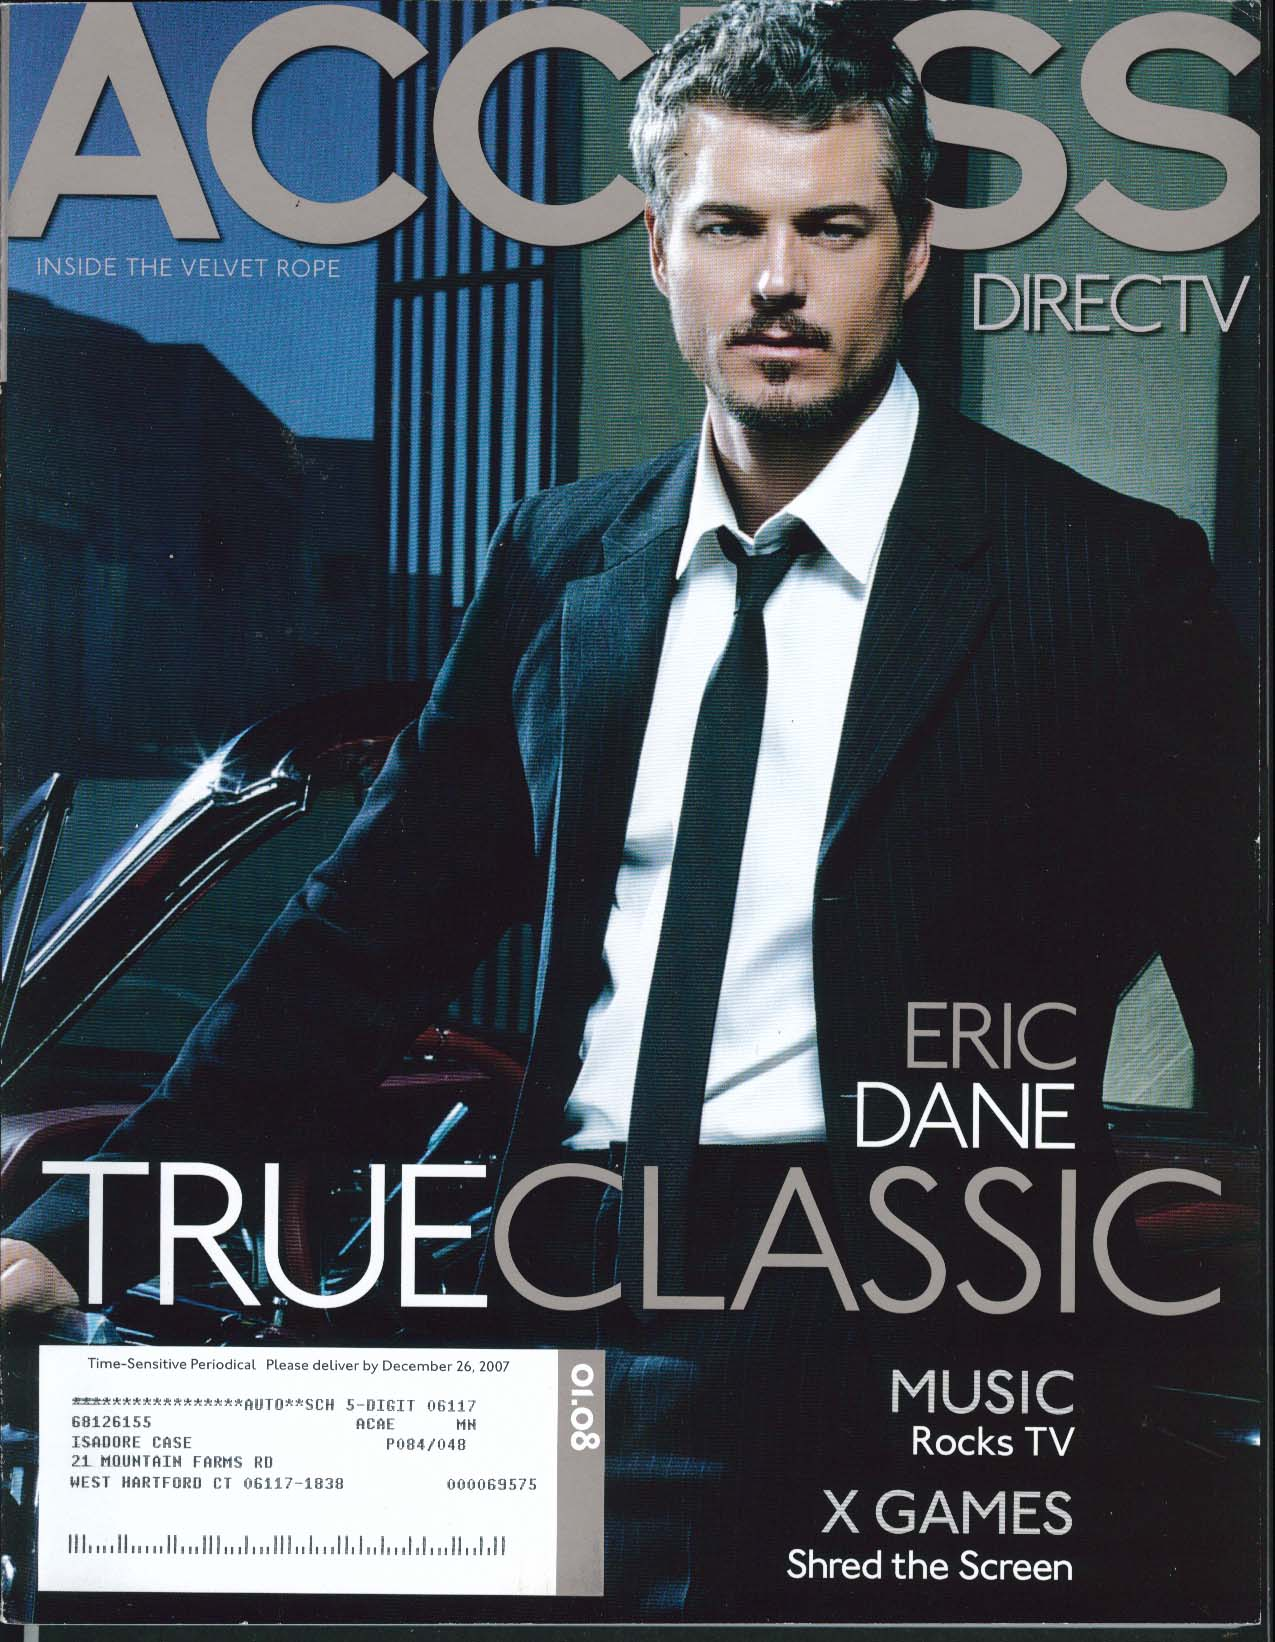 ACCESS DirecTV Eric Dane Martin Scorsese Rebecca Romijn 1 2008